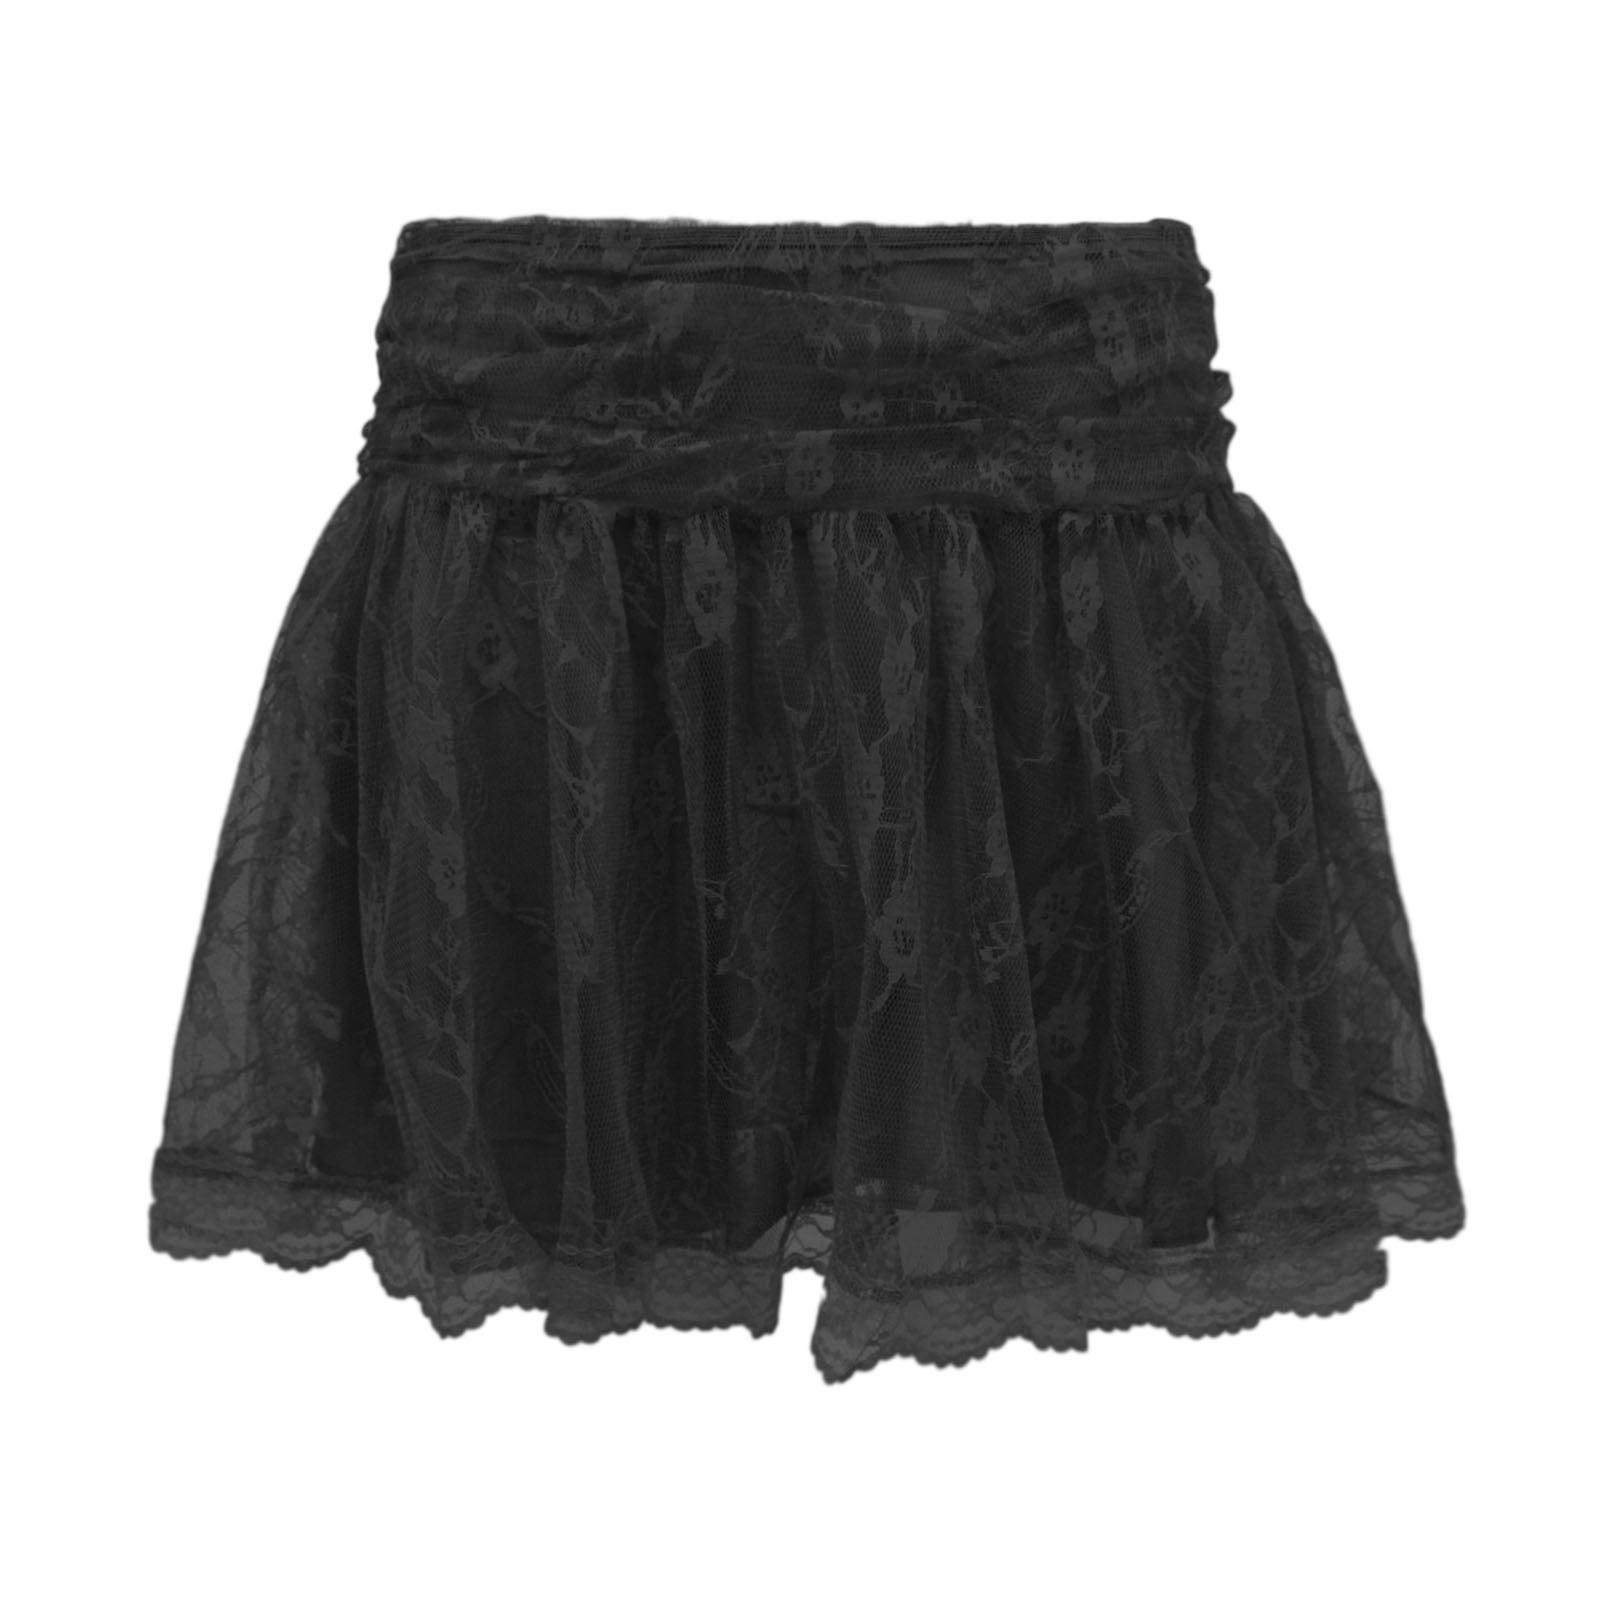 Lastest NEW Lace Skirts Fashion Women S Lady Crochet Tiered Lace Short Skirt